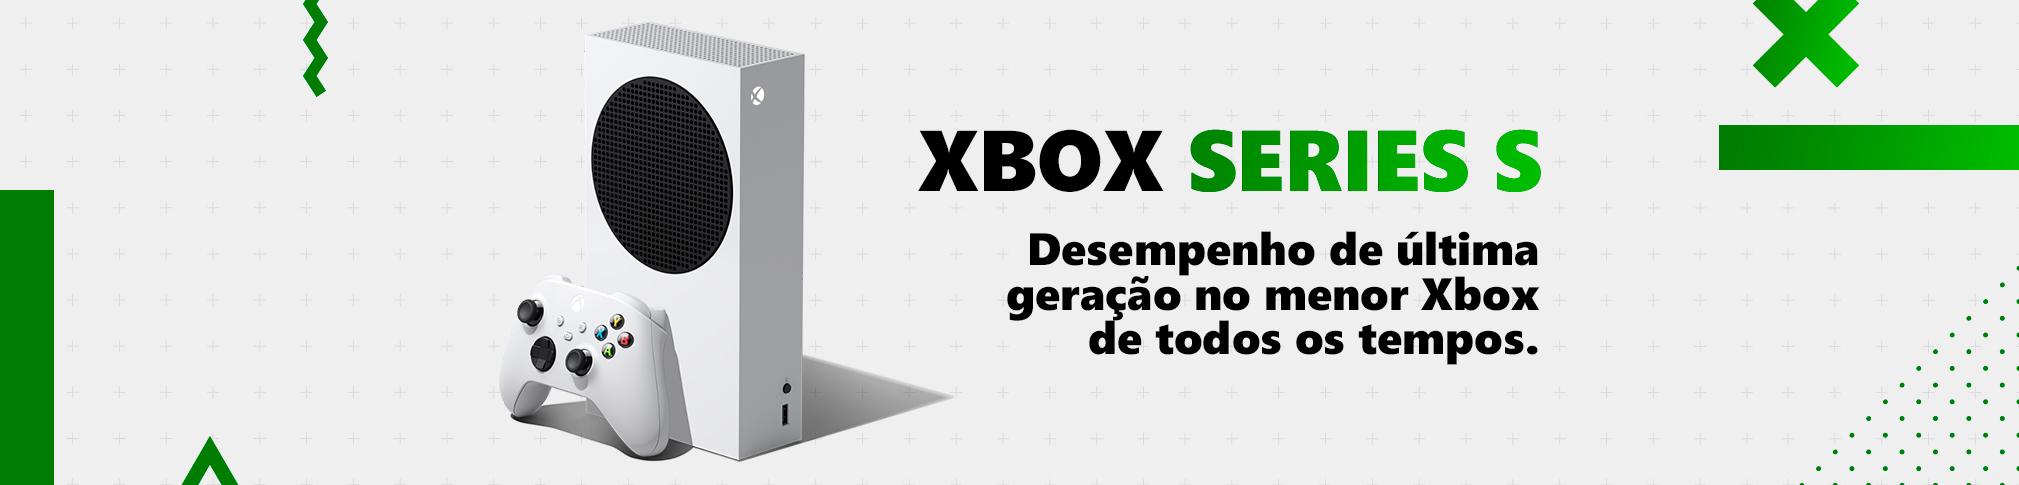 bannerXbox series S